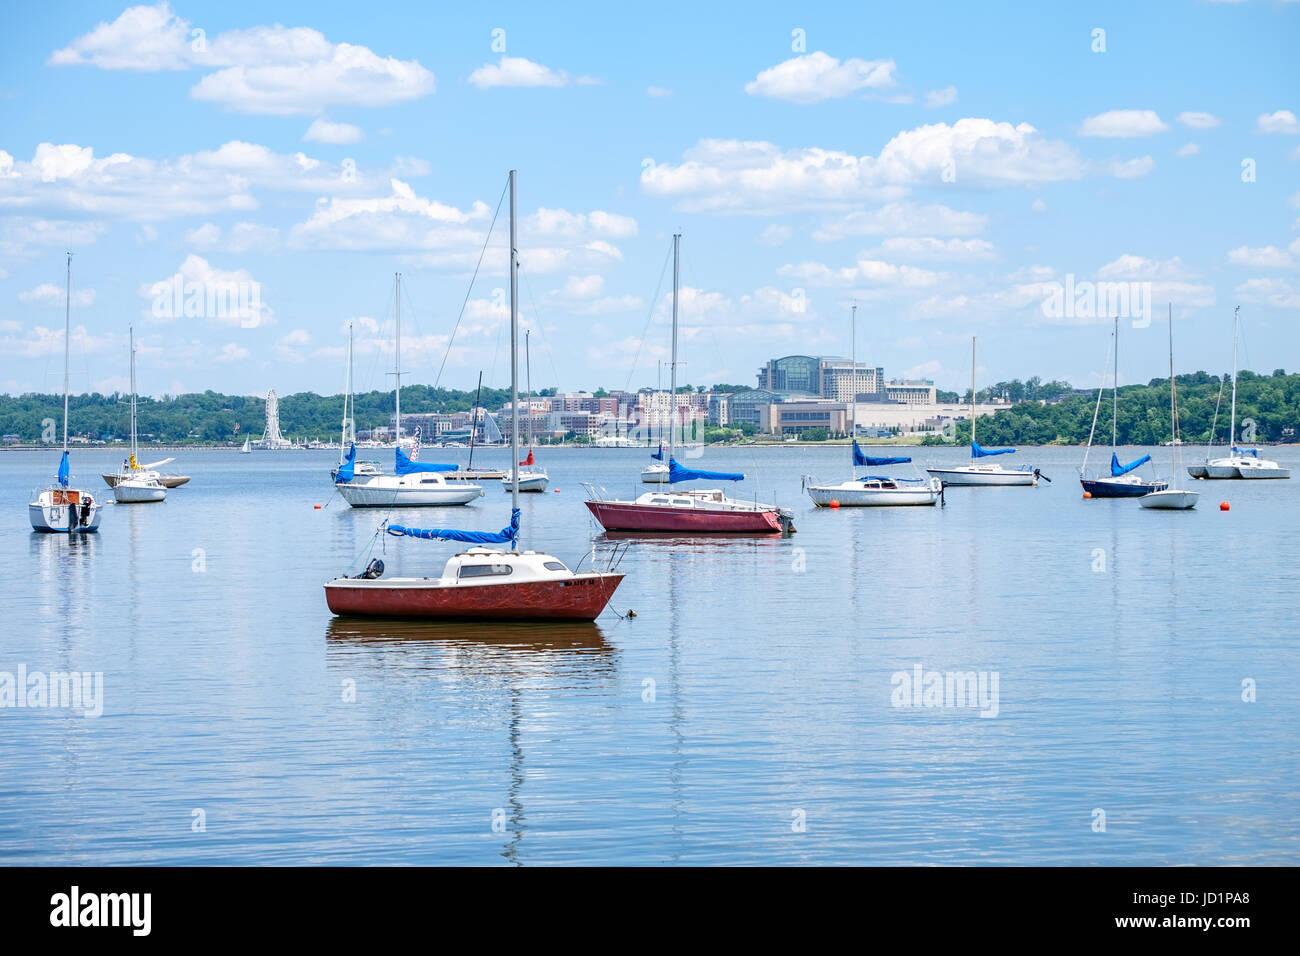 Sailboats anchored in the Potomac River - Stock Image